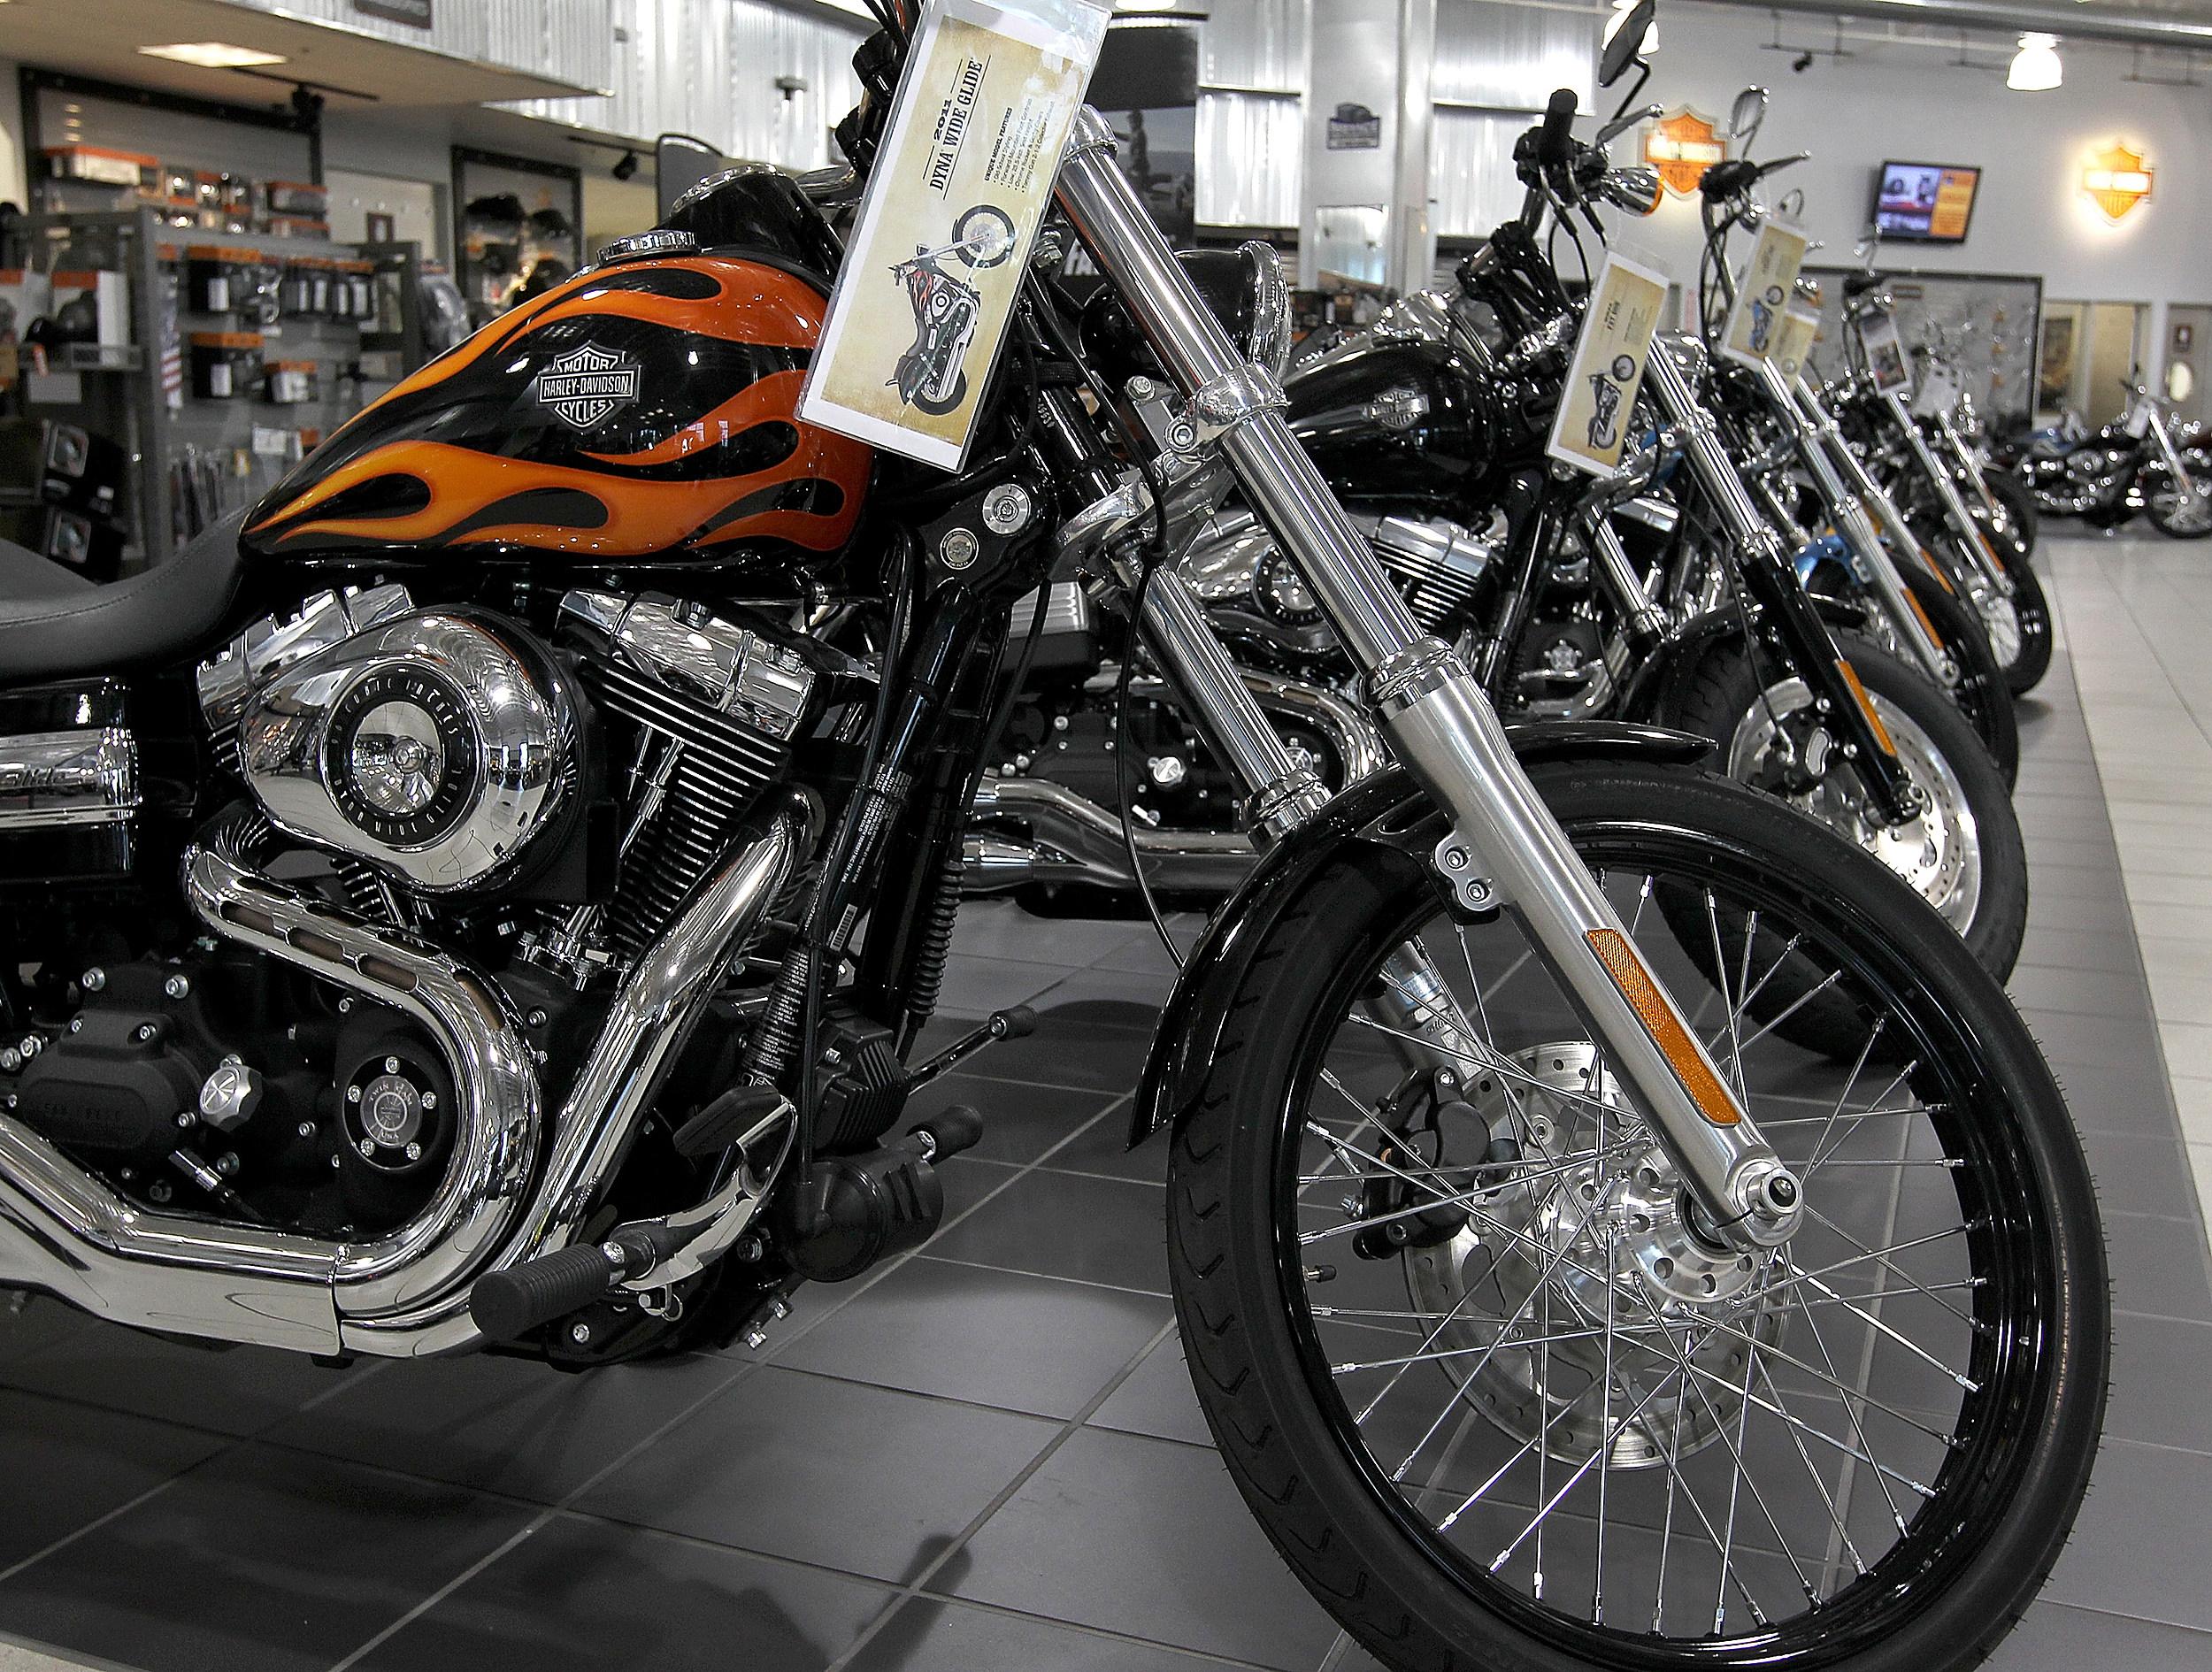 Win a free Harley at Barnett Blood Drive